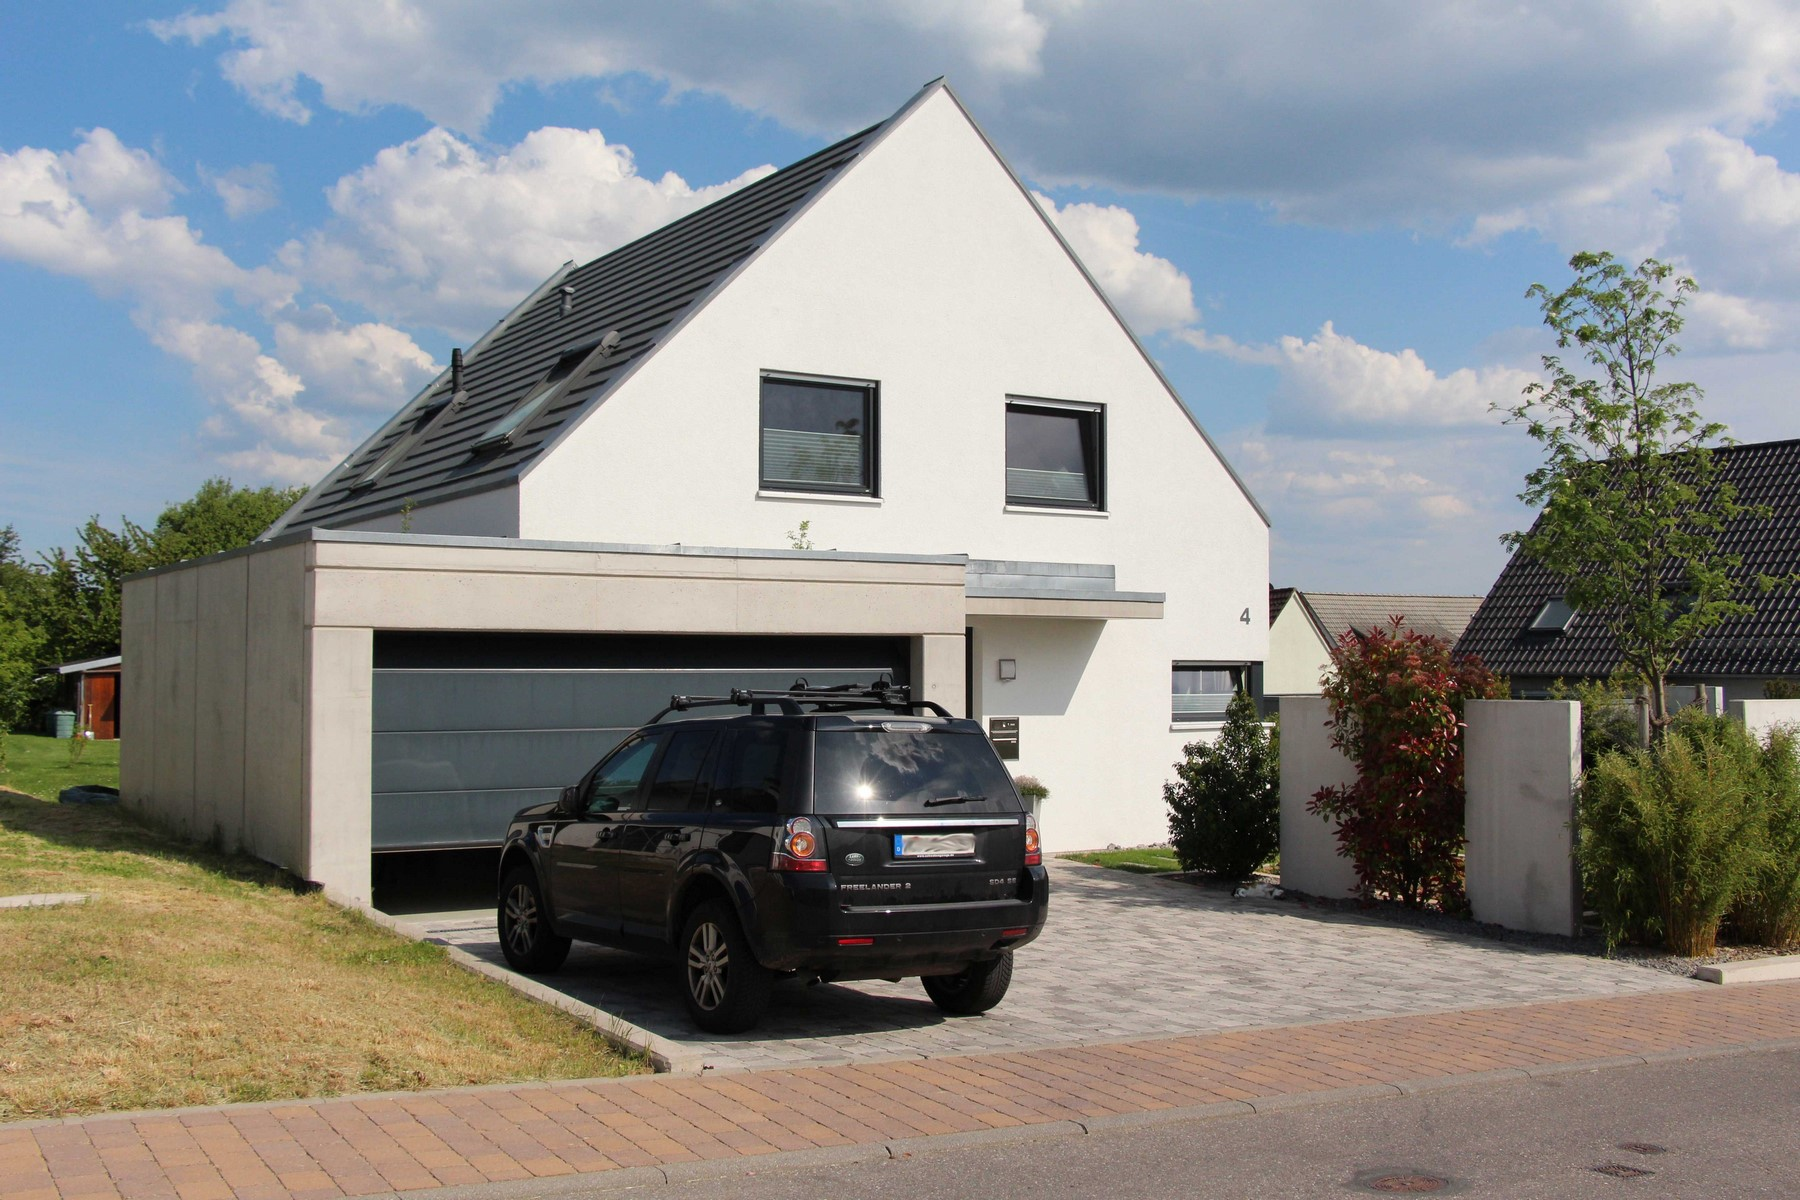 Einfamilienhaus neubau mit doppelgarage  Joachim-Kuenzel | Neubau · Umbau · Ausbau · Sanierung